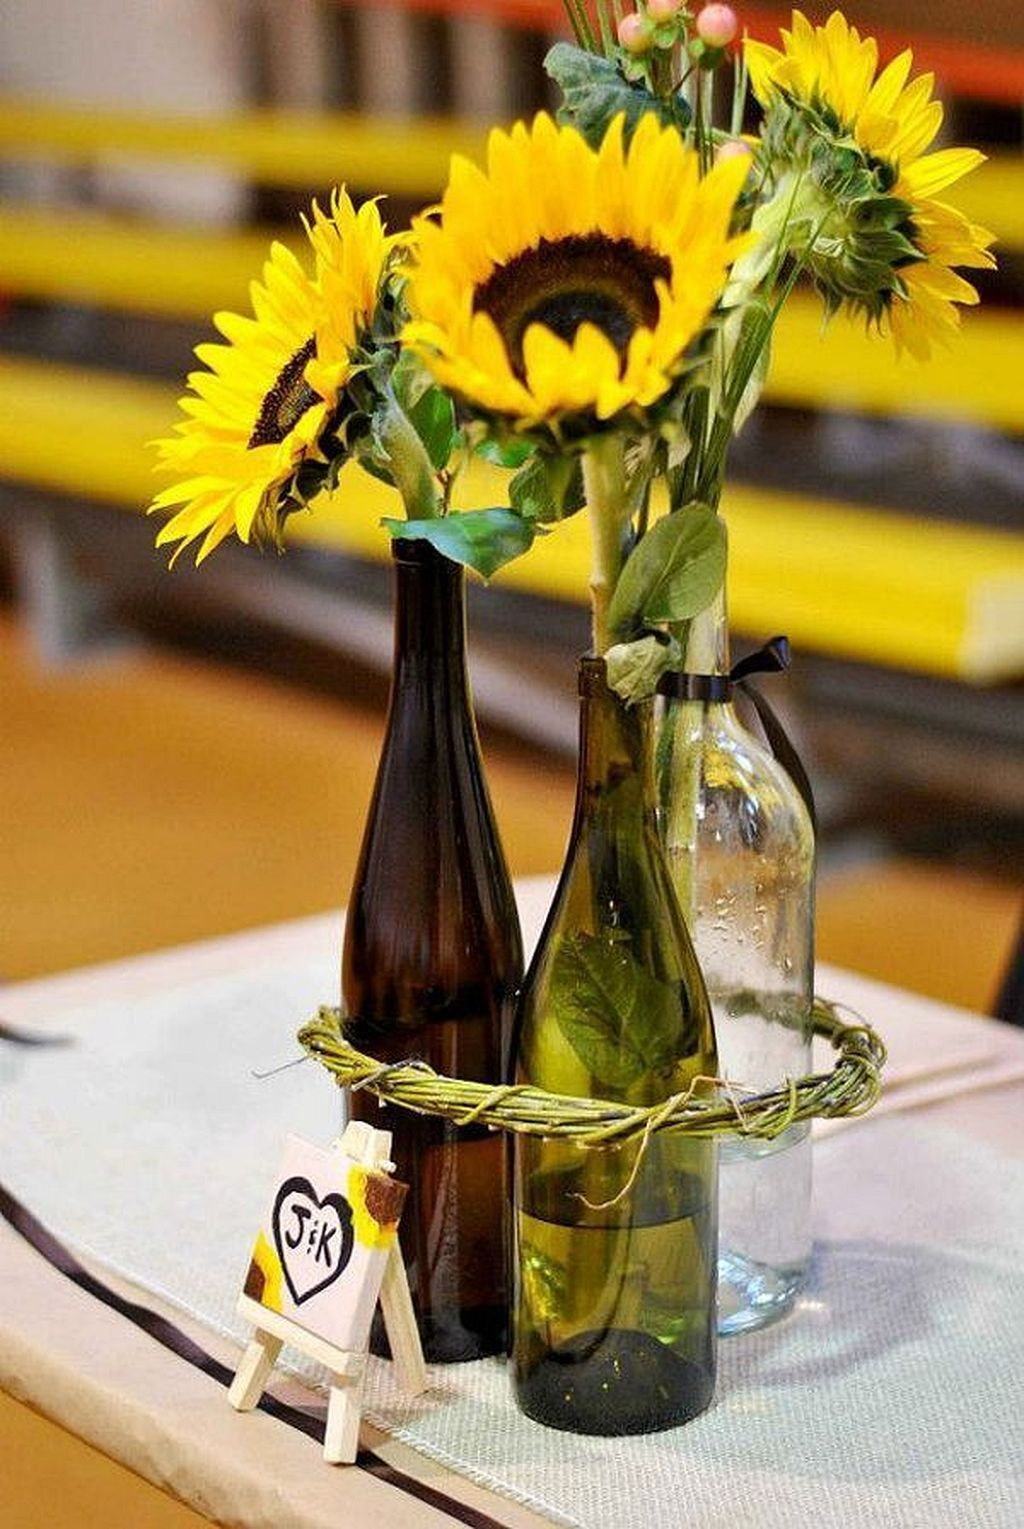 Awesome 90+ Ideas Sunflower Wedding Theme  https://weddmagz.com/90-ideas-sunflower-w… | Wine bottle centerpieces, Bottle  centerpieces, Sunflower wedding centerpieces